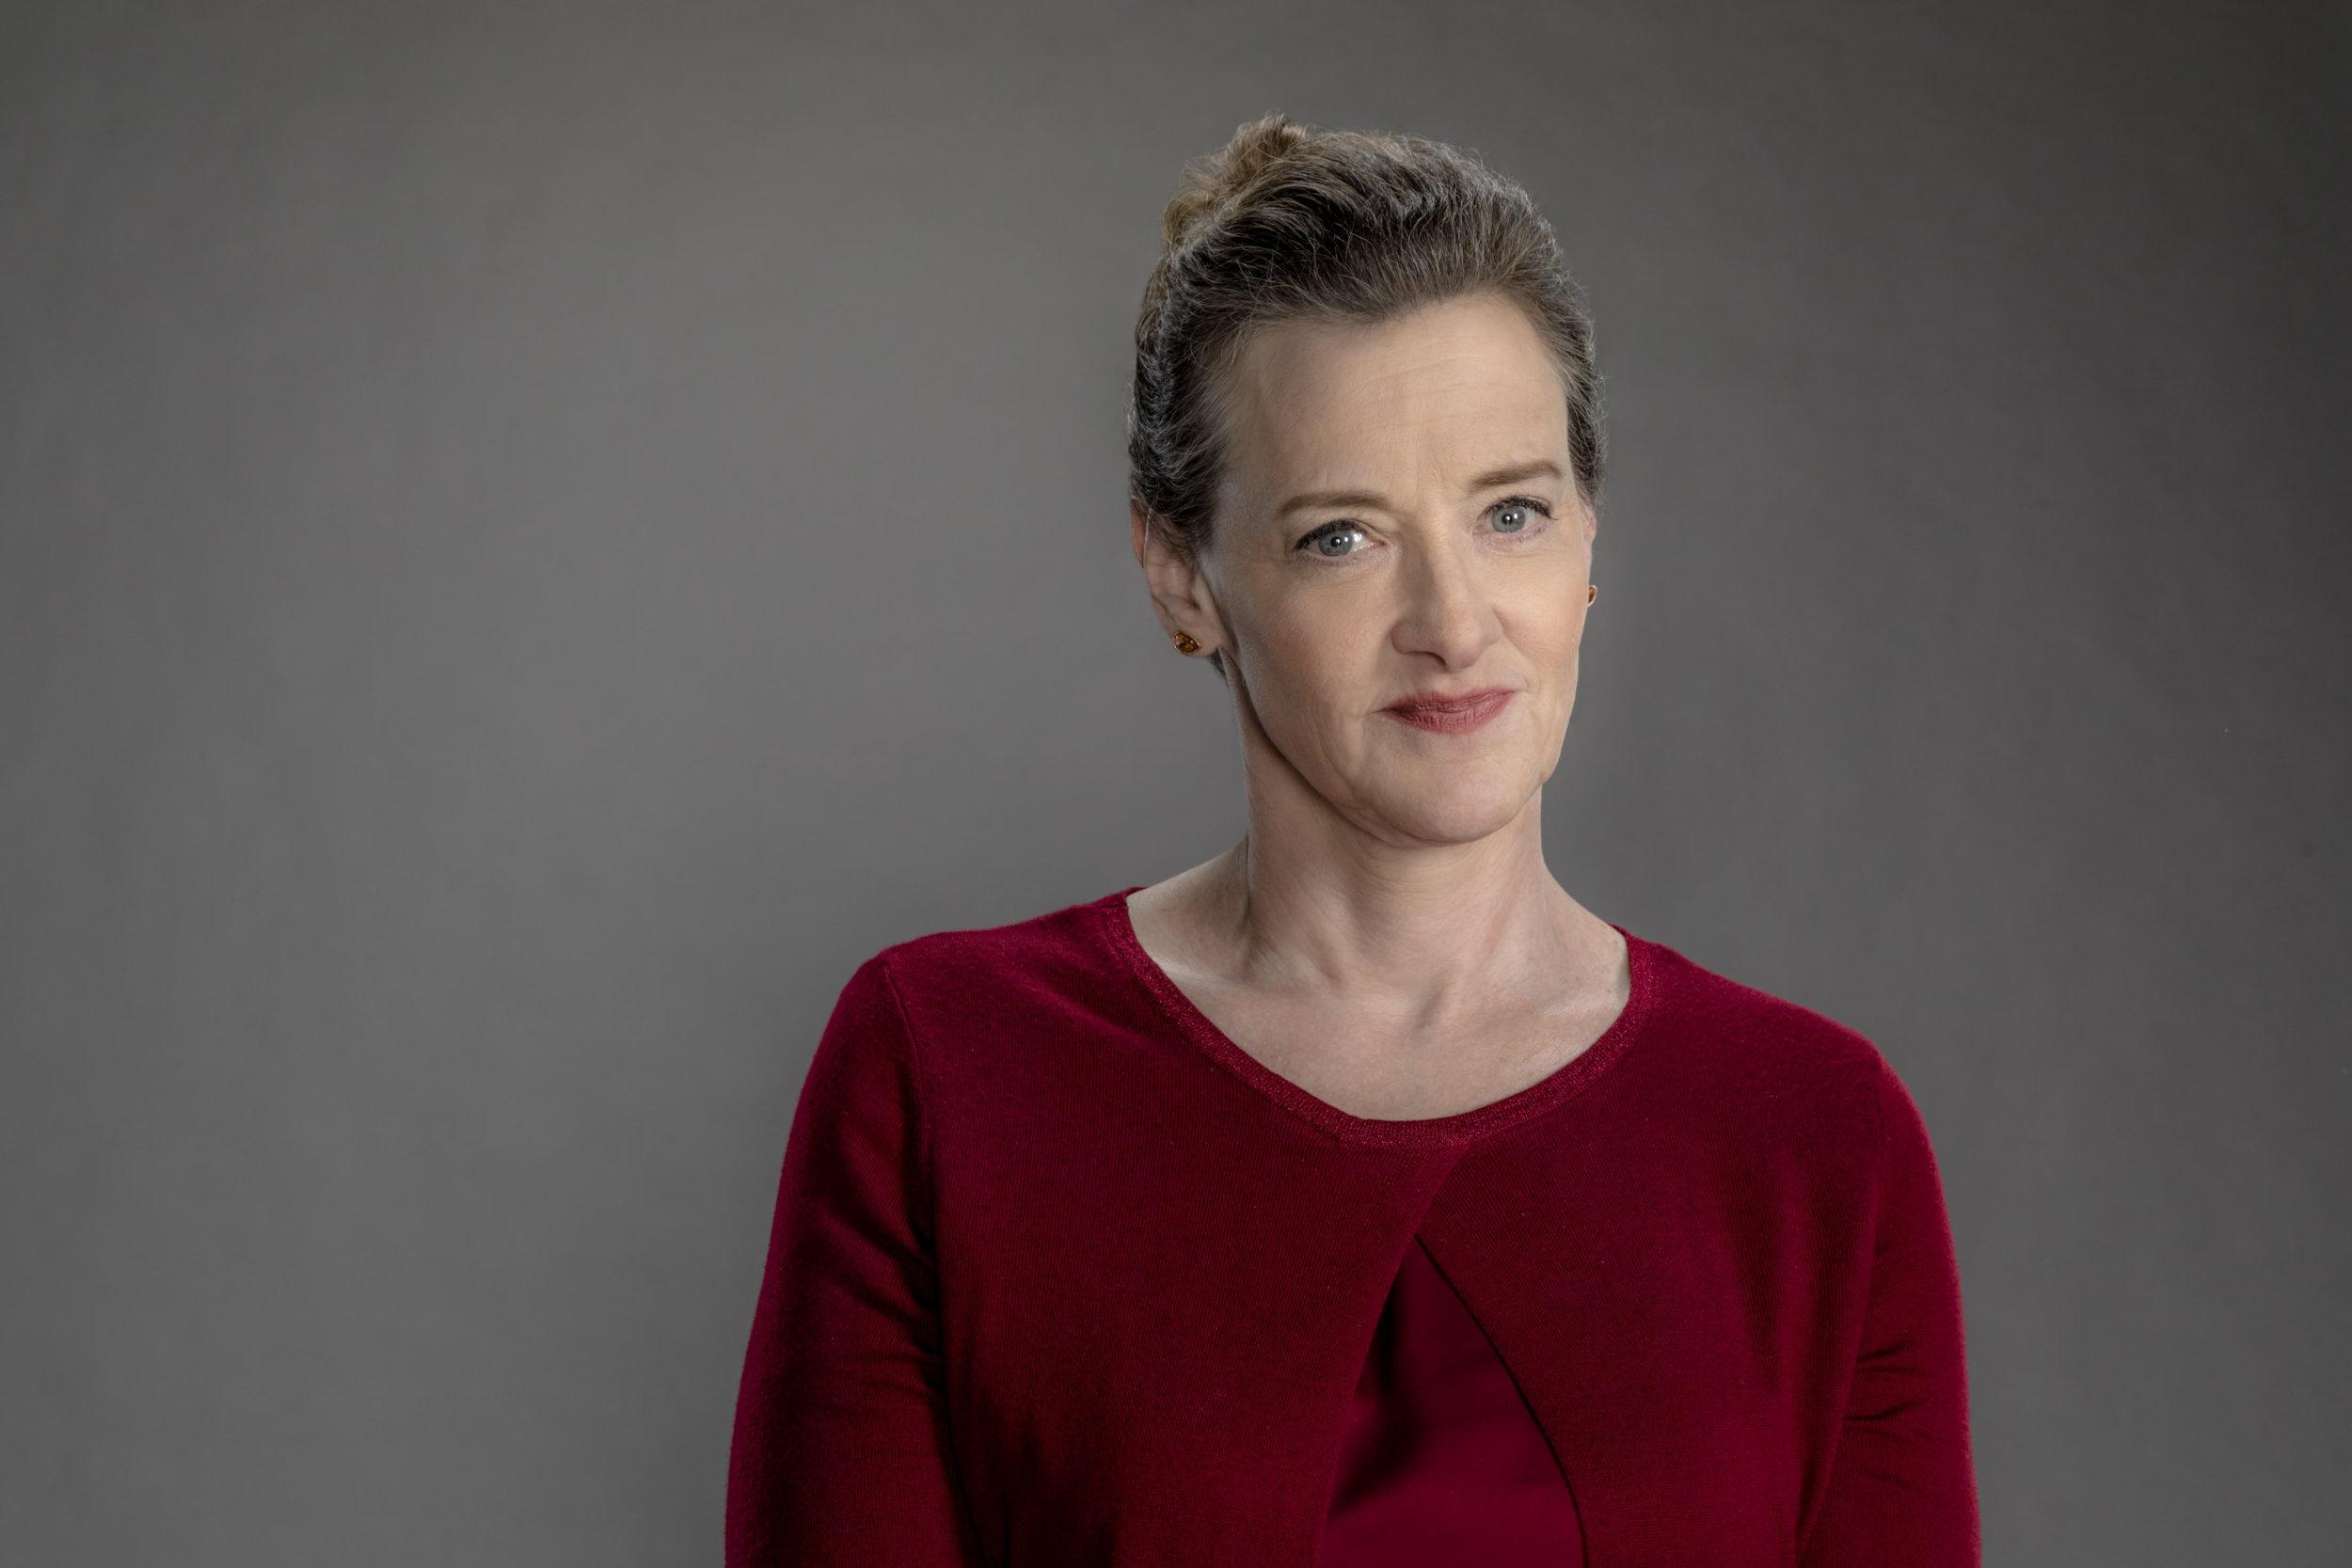 Joan Cusack 2018 worth – CountryBaptist